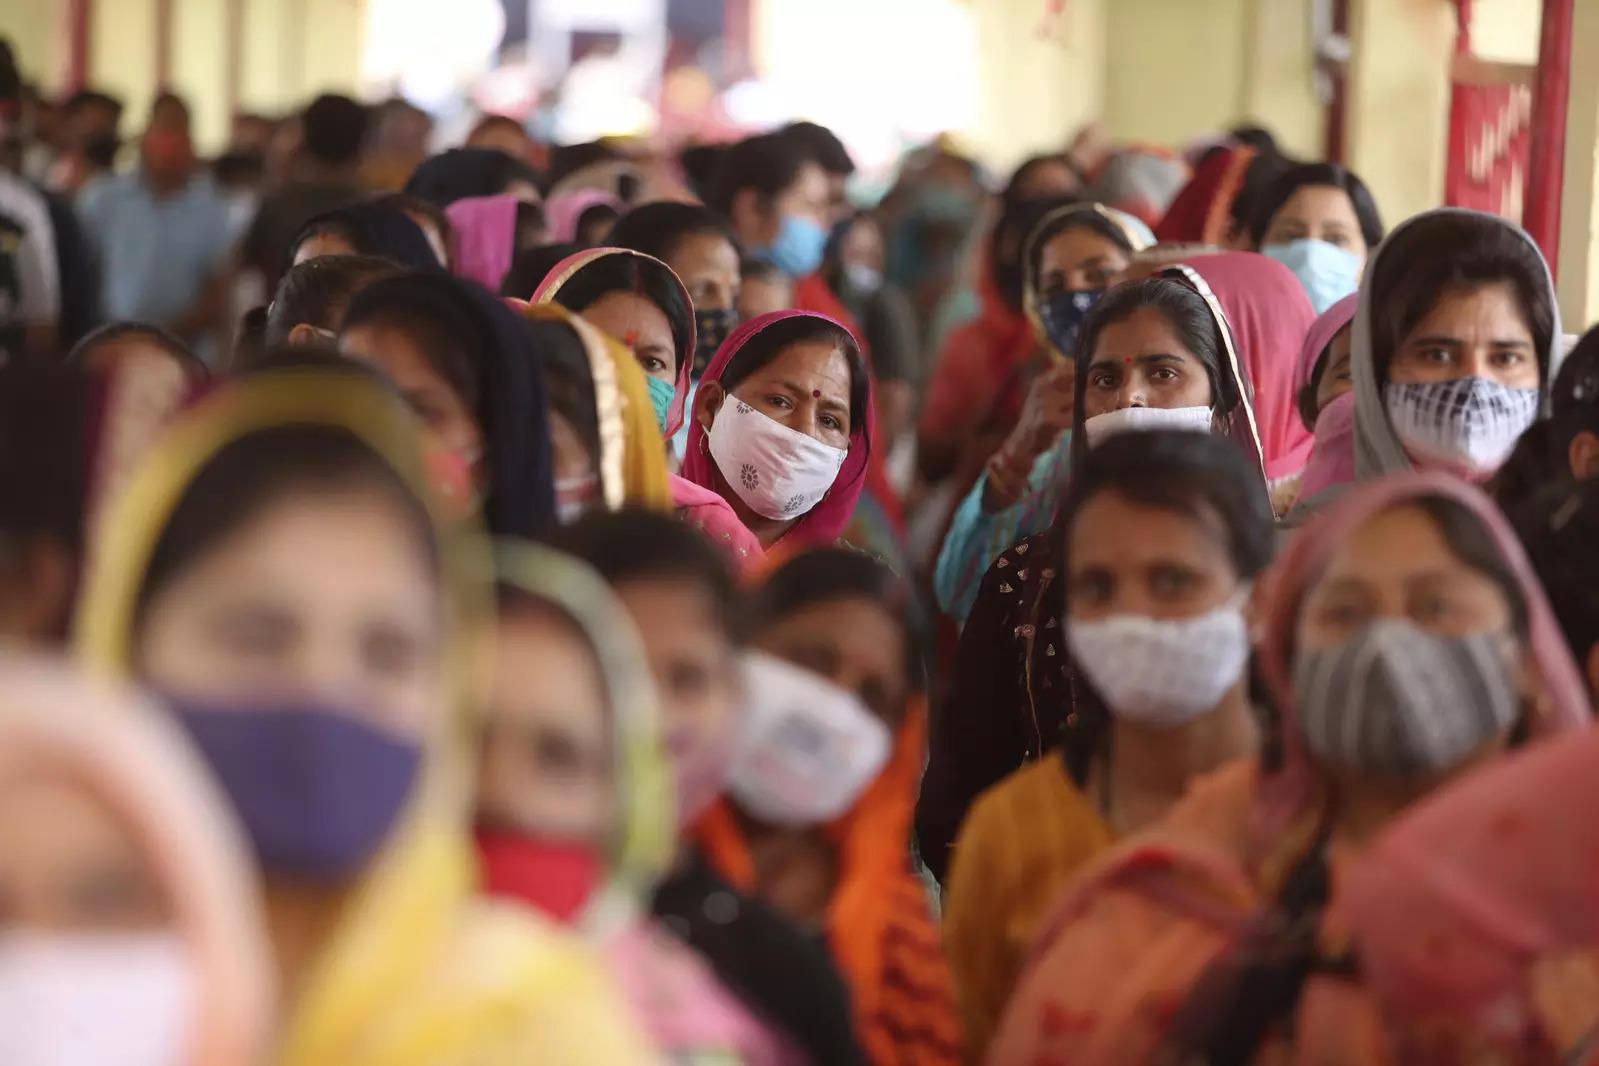 Unabated surge: 365 deaths, 34,875 fresh Covid-19 cases in Tamil Nadu